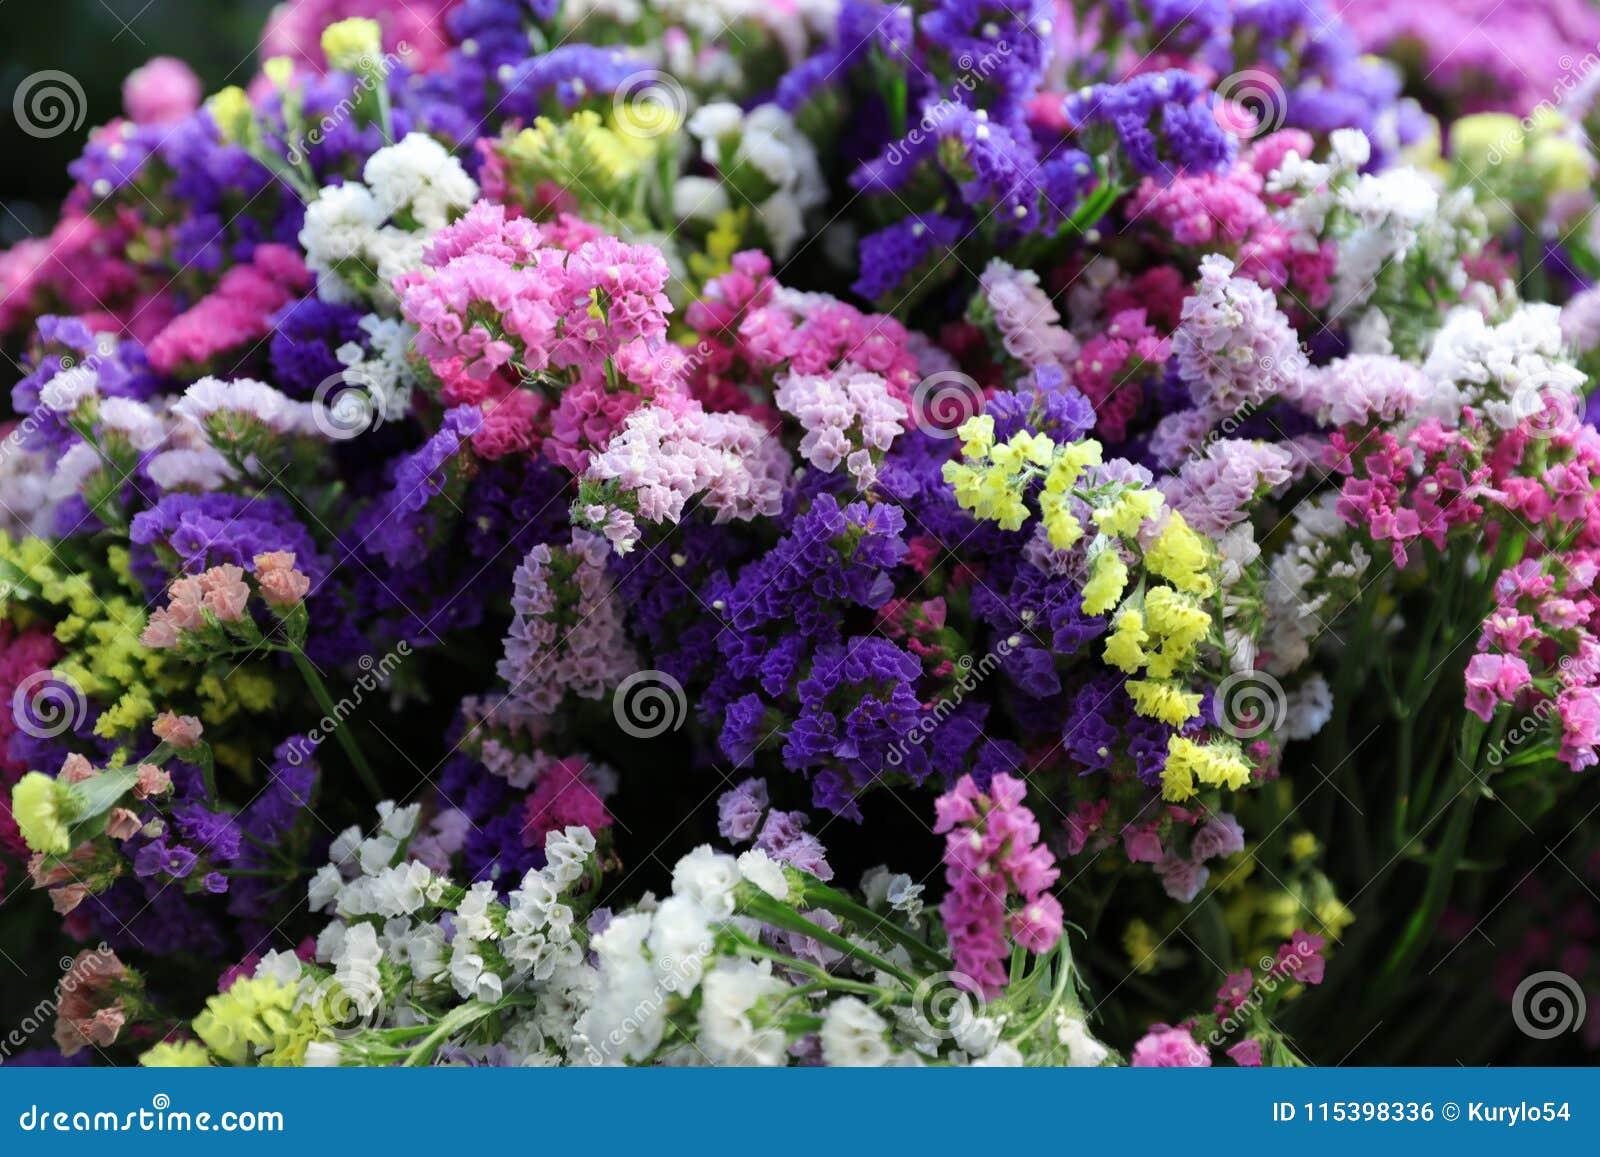 Variety Of Limonium Sinuatum Or Statice Salem Flowers In Blue Lilac